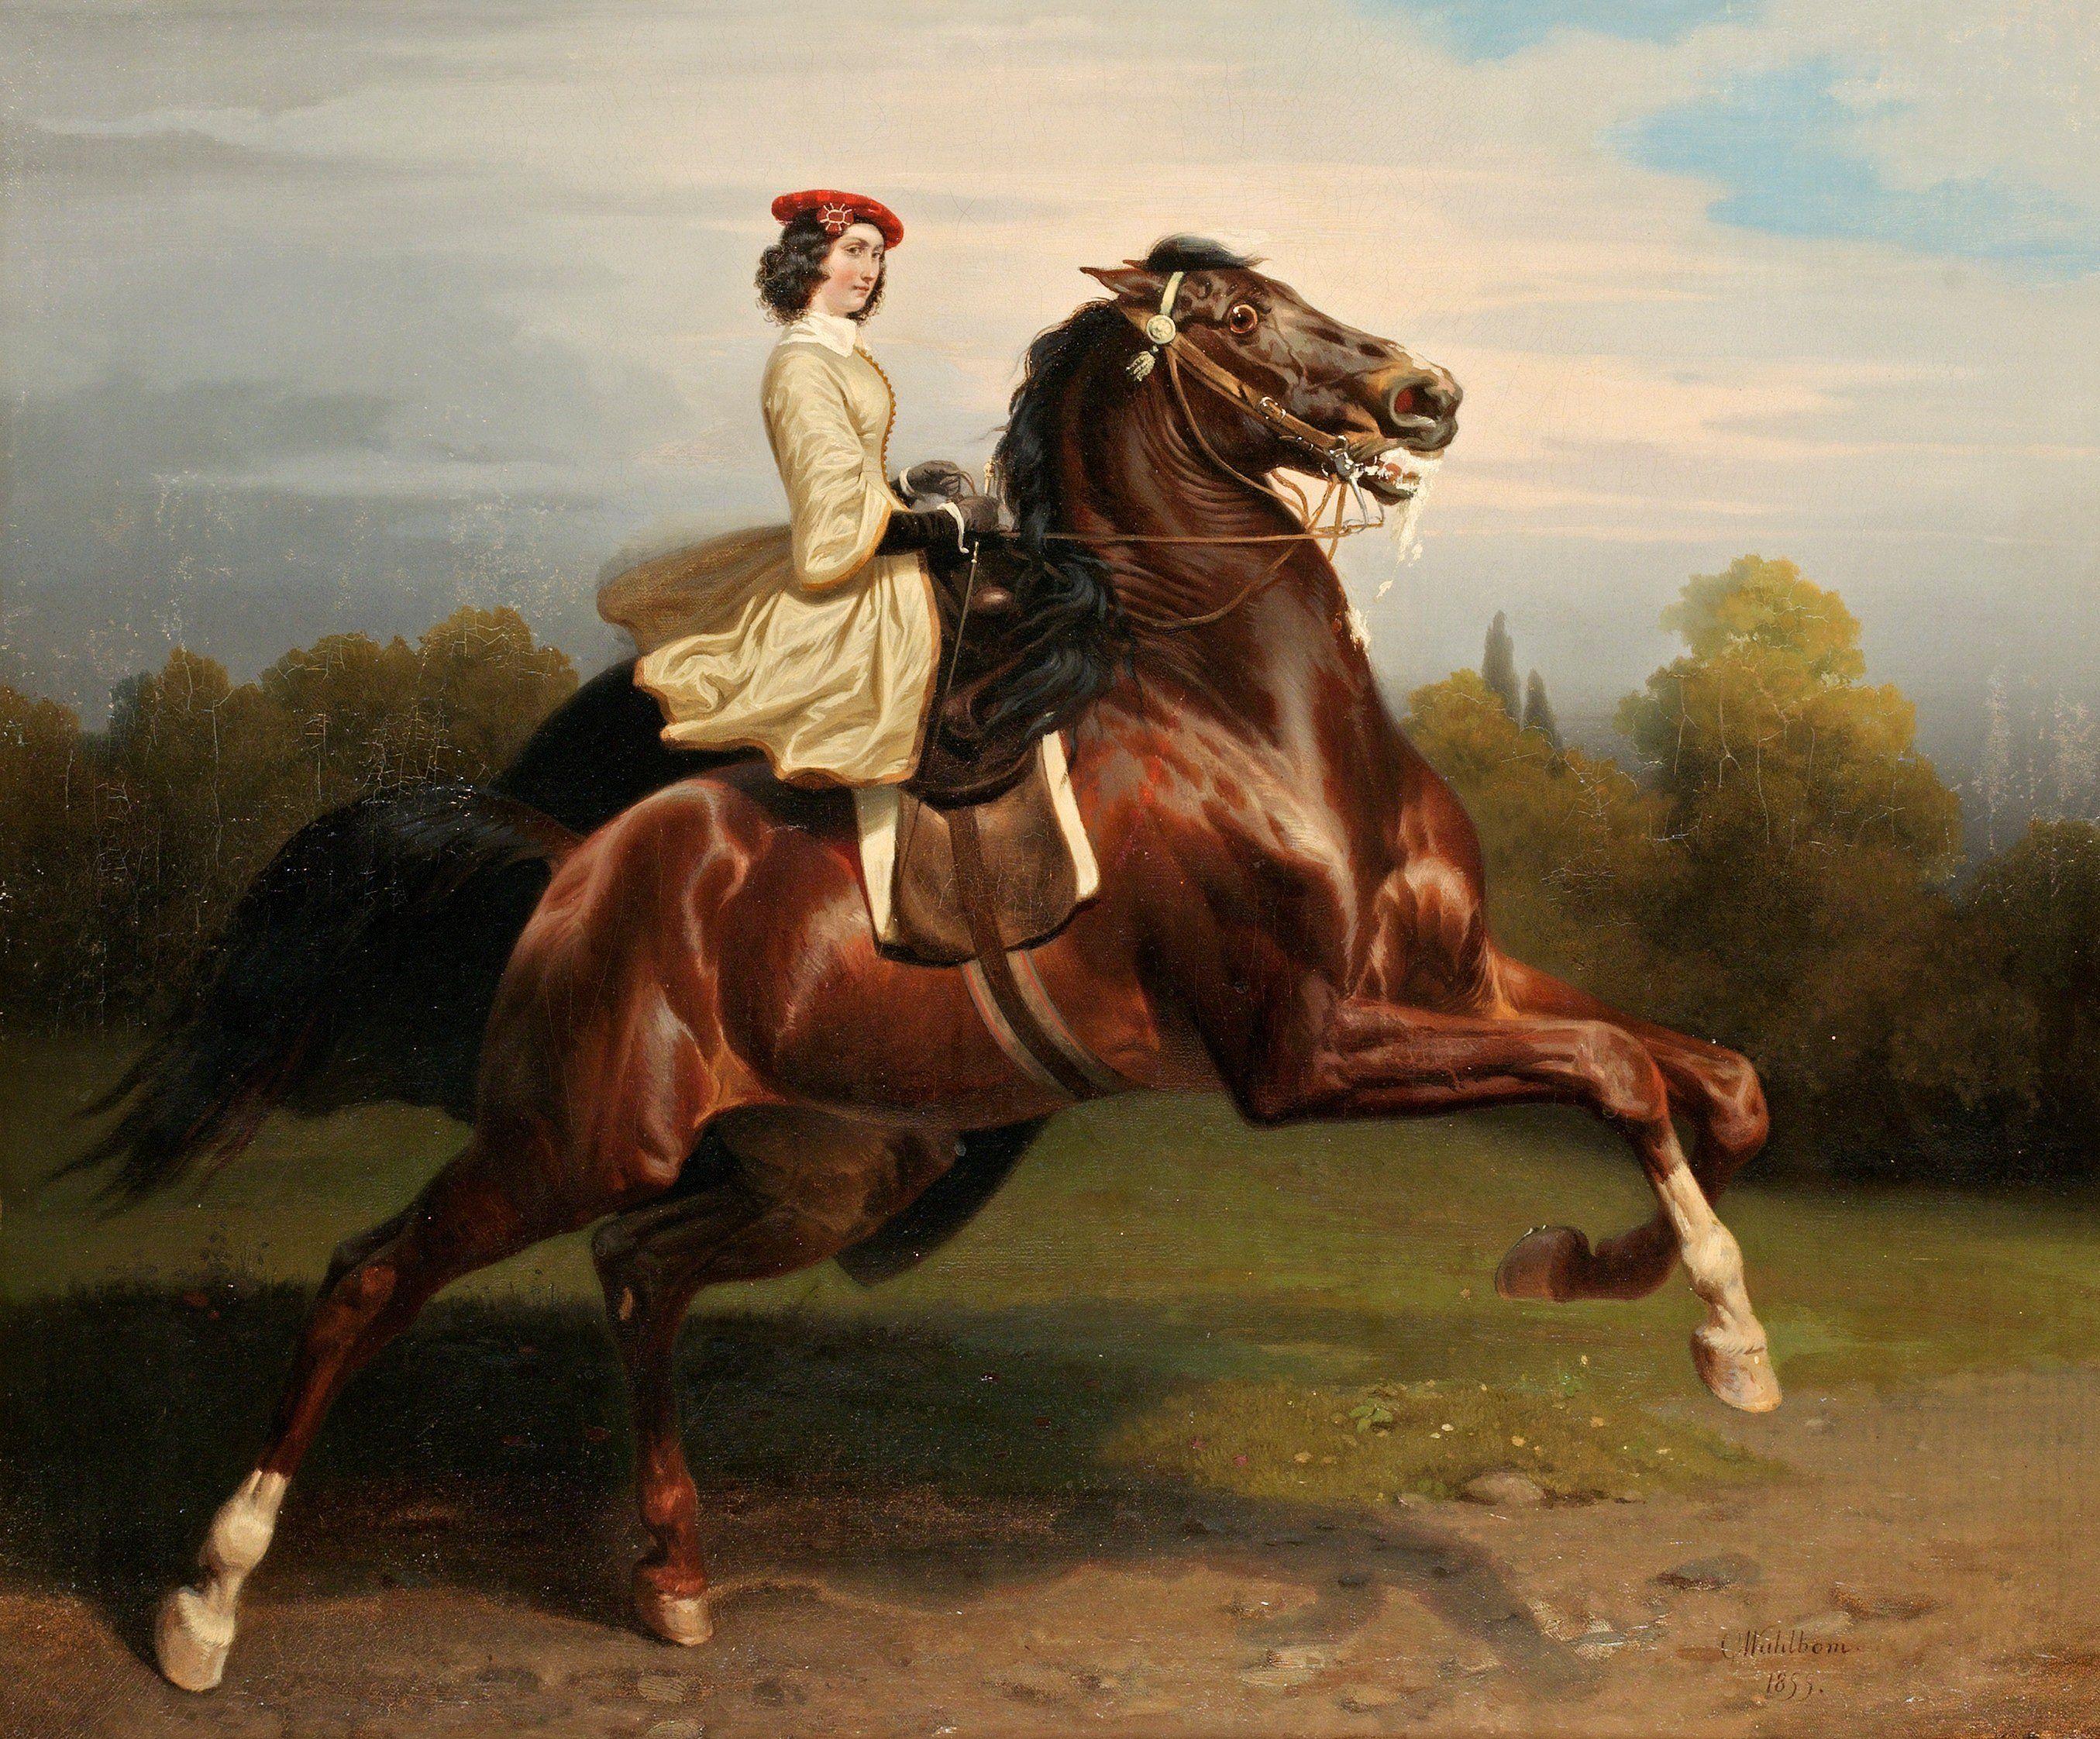 Horses by edwin muir essay